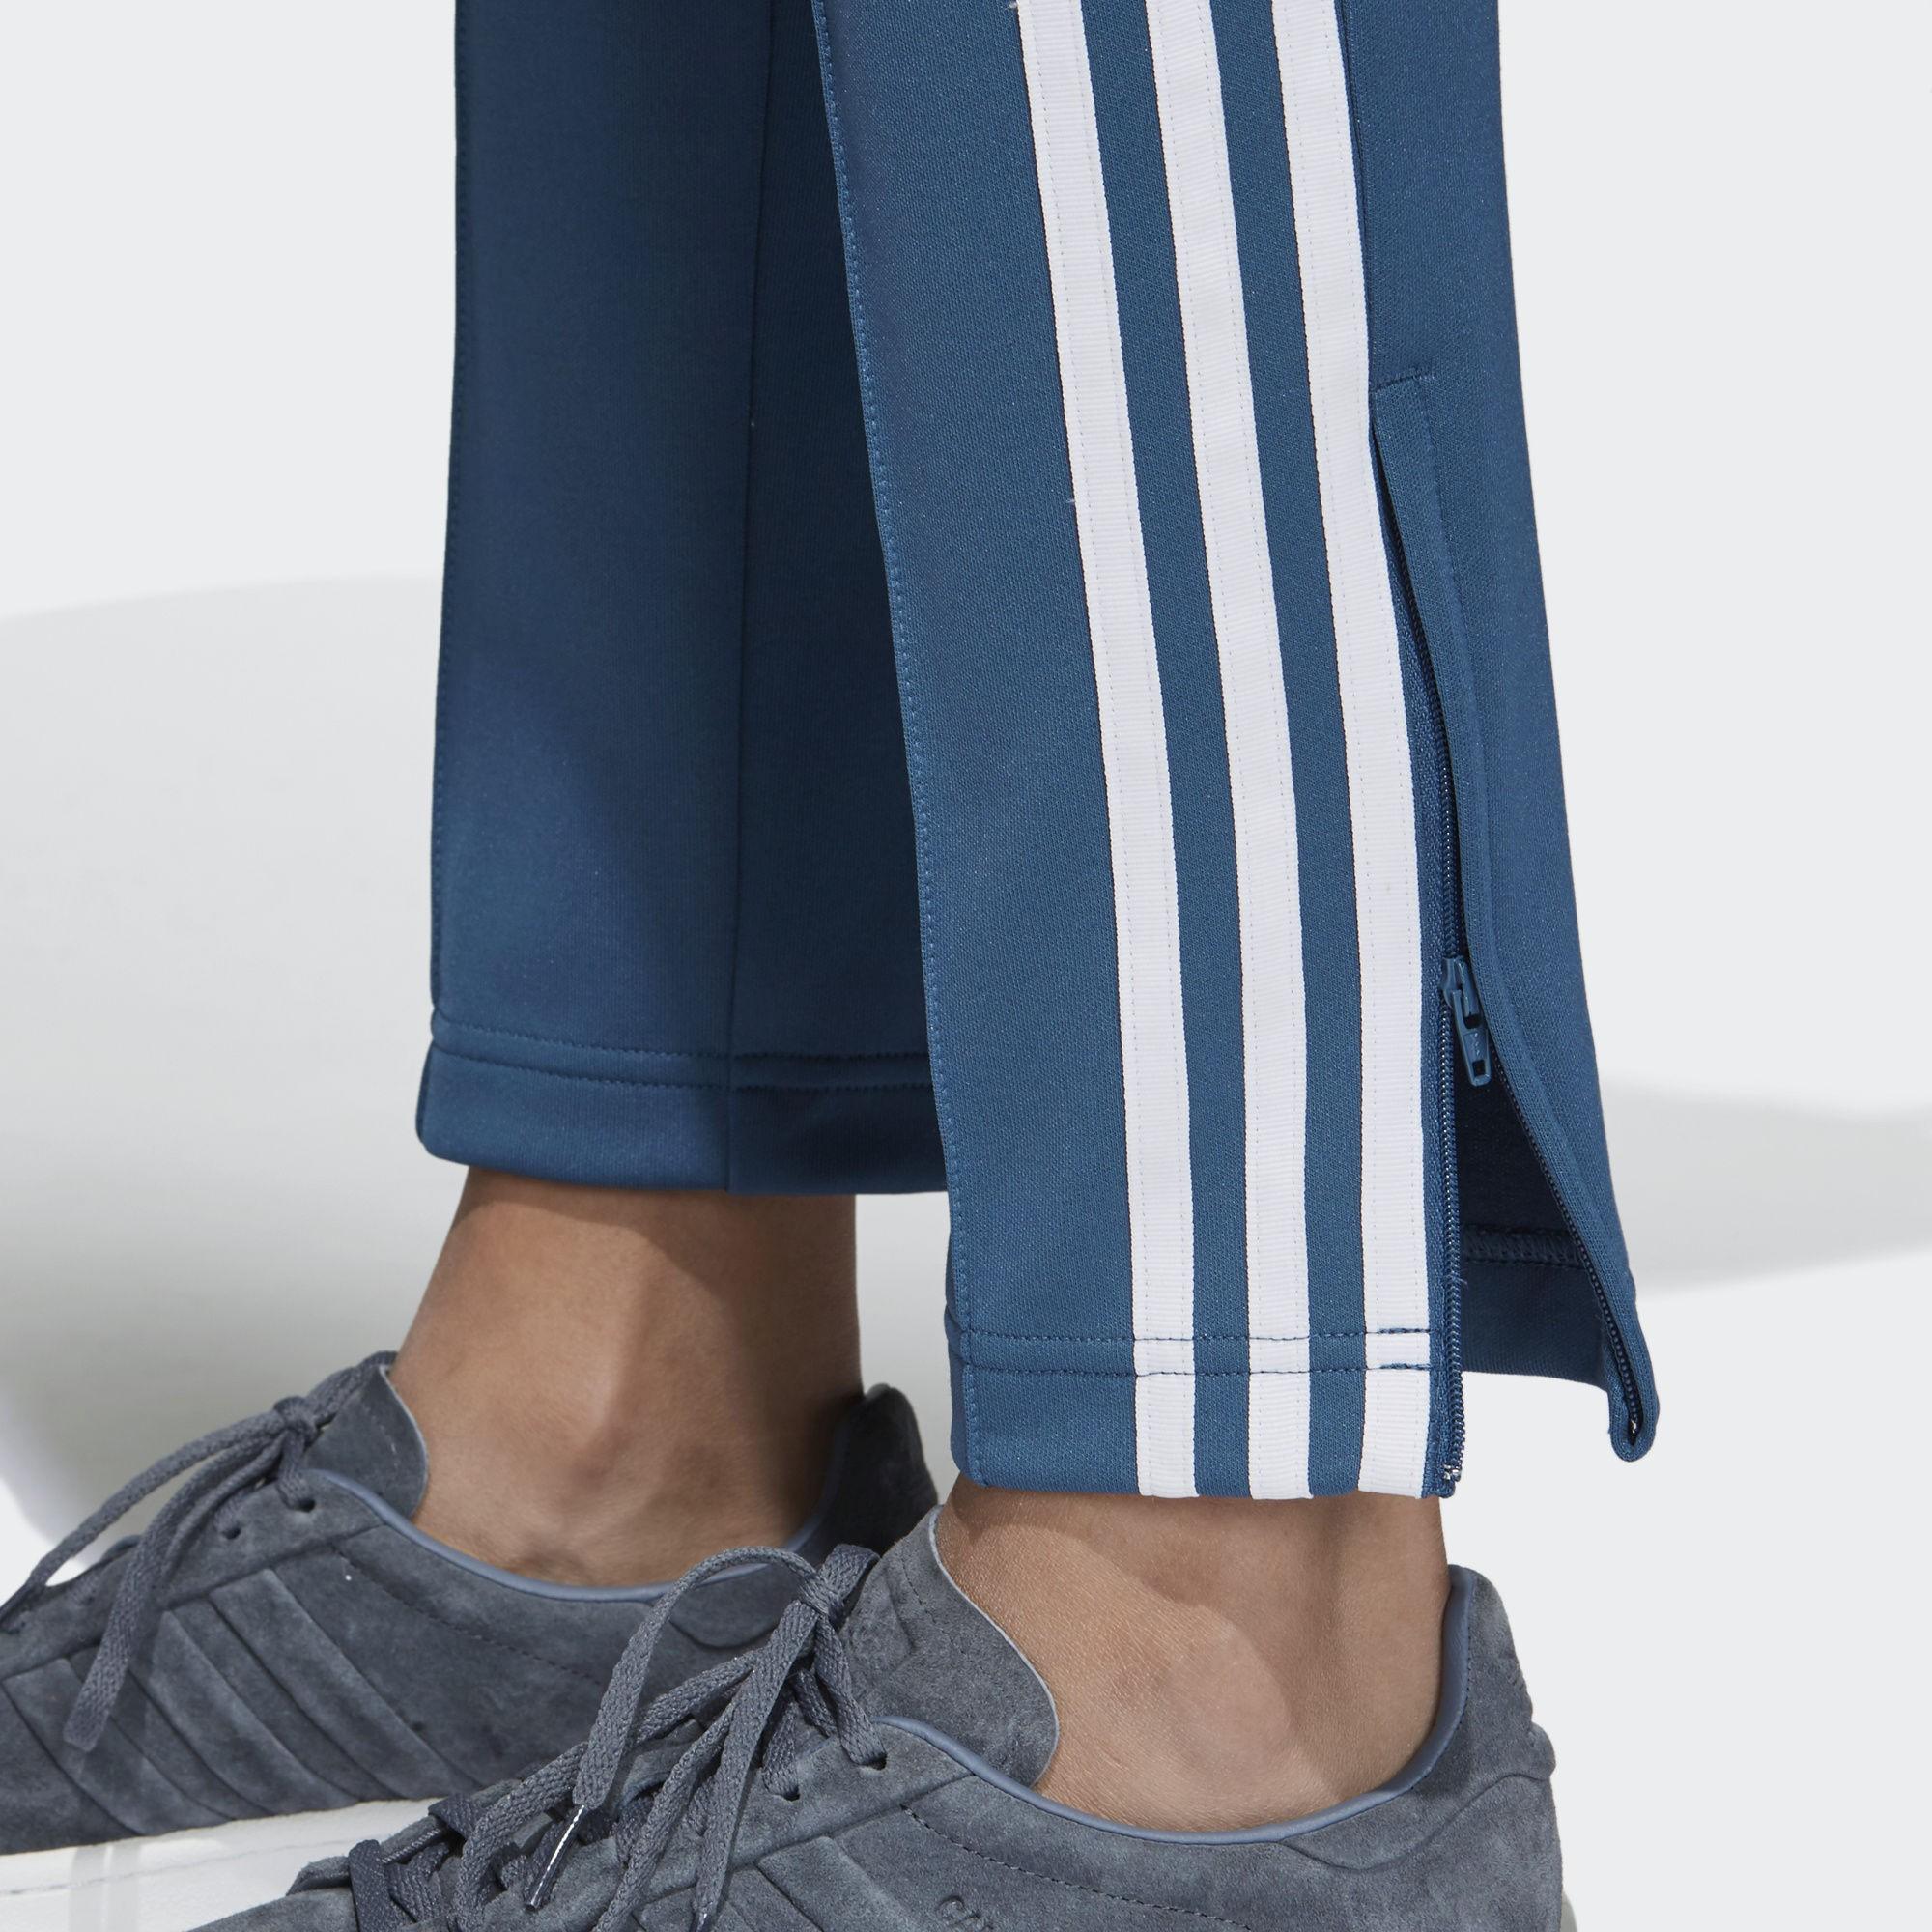 e4cc446d9706 Venta de Pantalón Adidas Sst Tp Azul Mujer - Deportes Moya